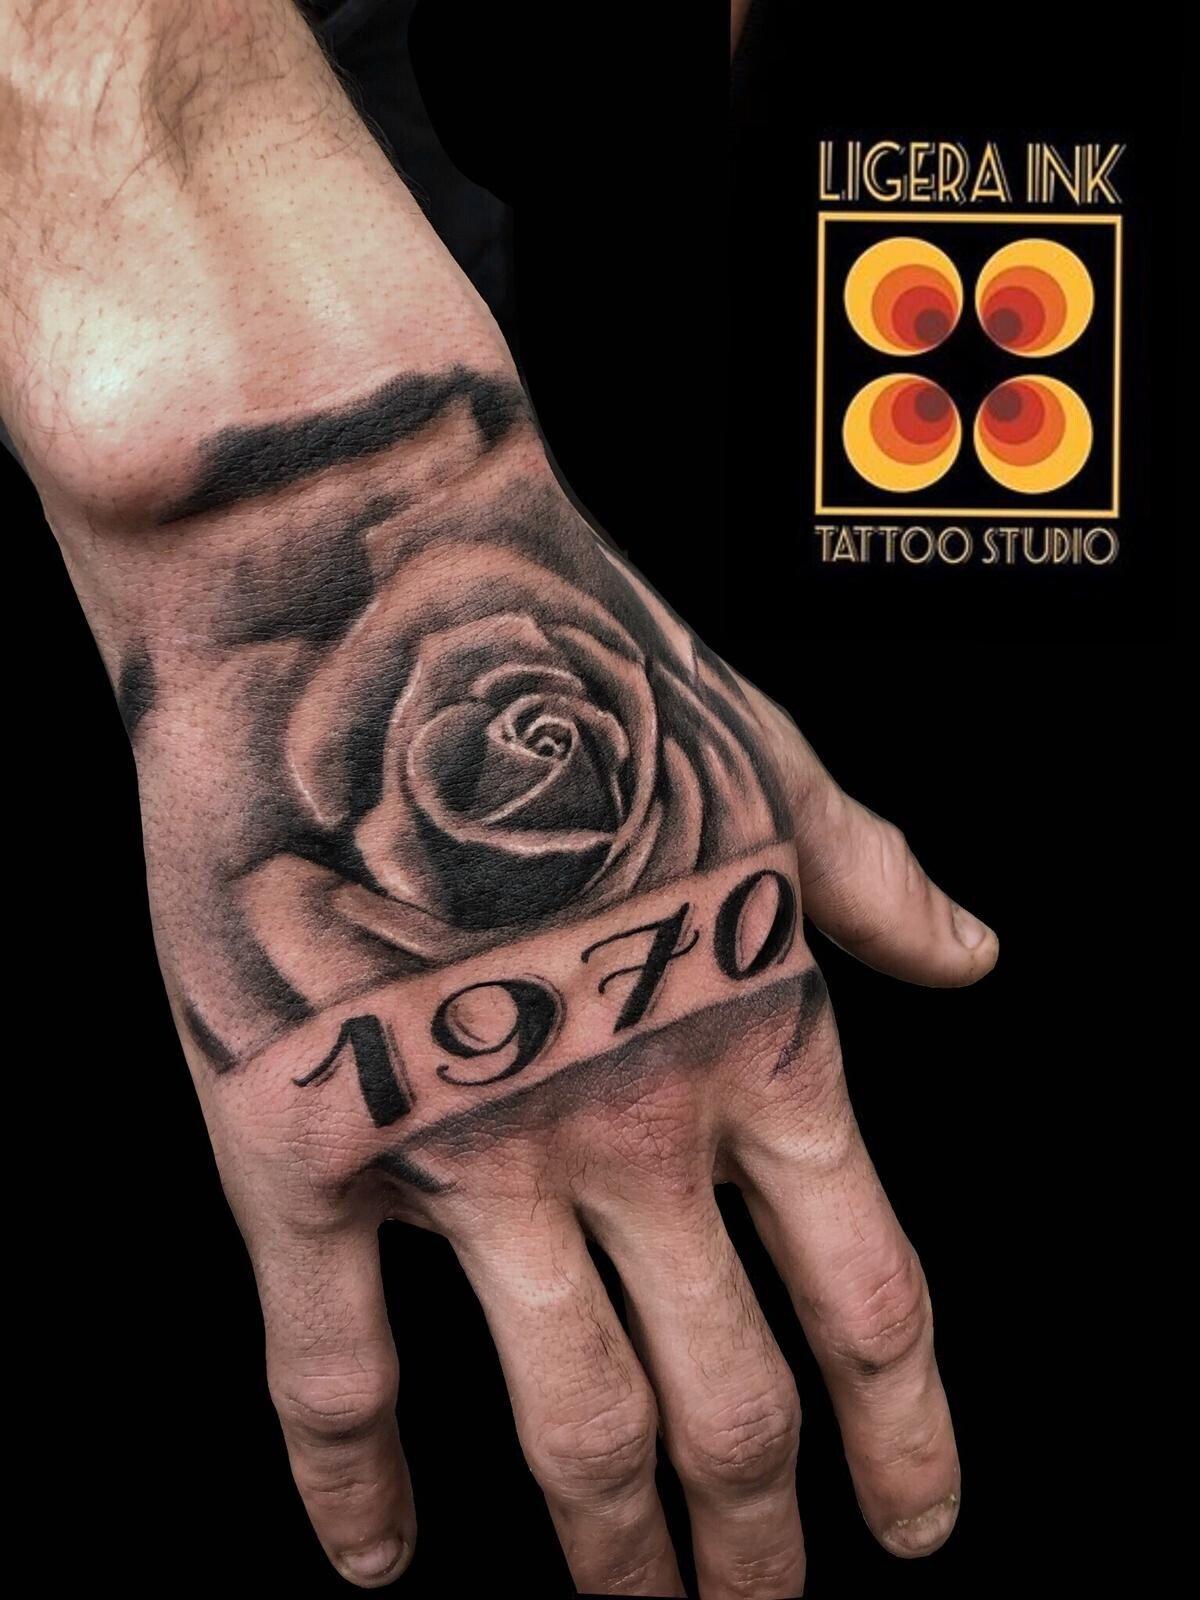 Ligera-ink-tattoo-milano-tatuaggi-milano-migliori-tatuatori-milano-tattoo-realistici-milano-tatuaggi-realistici-milano-tattoo-ritratto-milano-tatuaggio-ritratto-milano-tatuaggio-rosa-mano